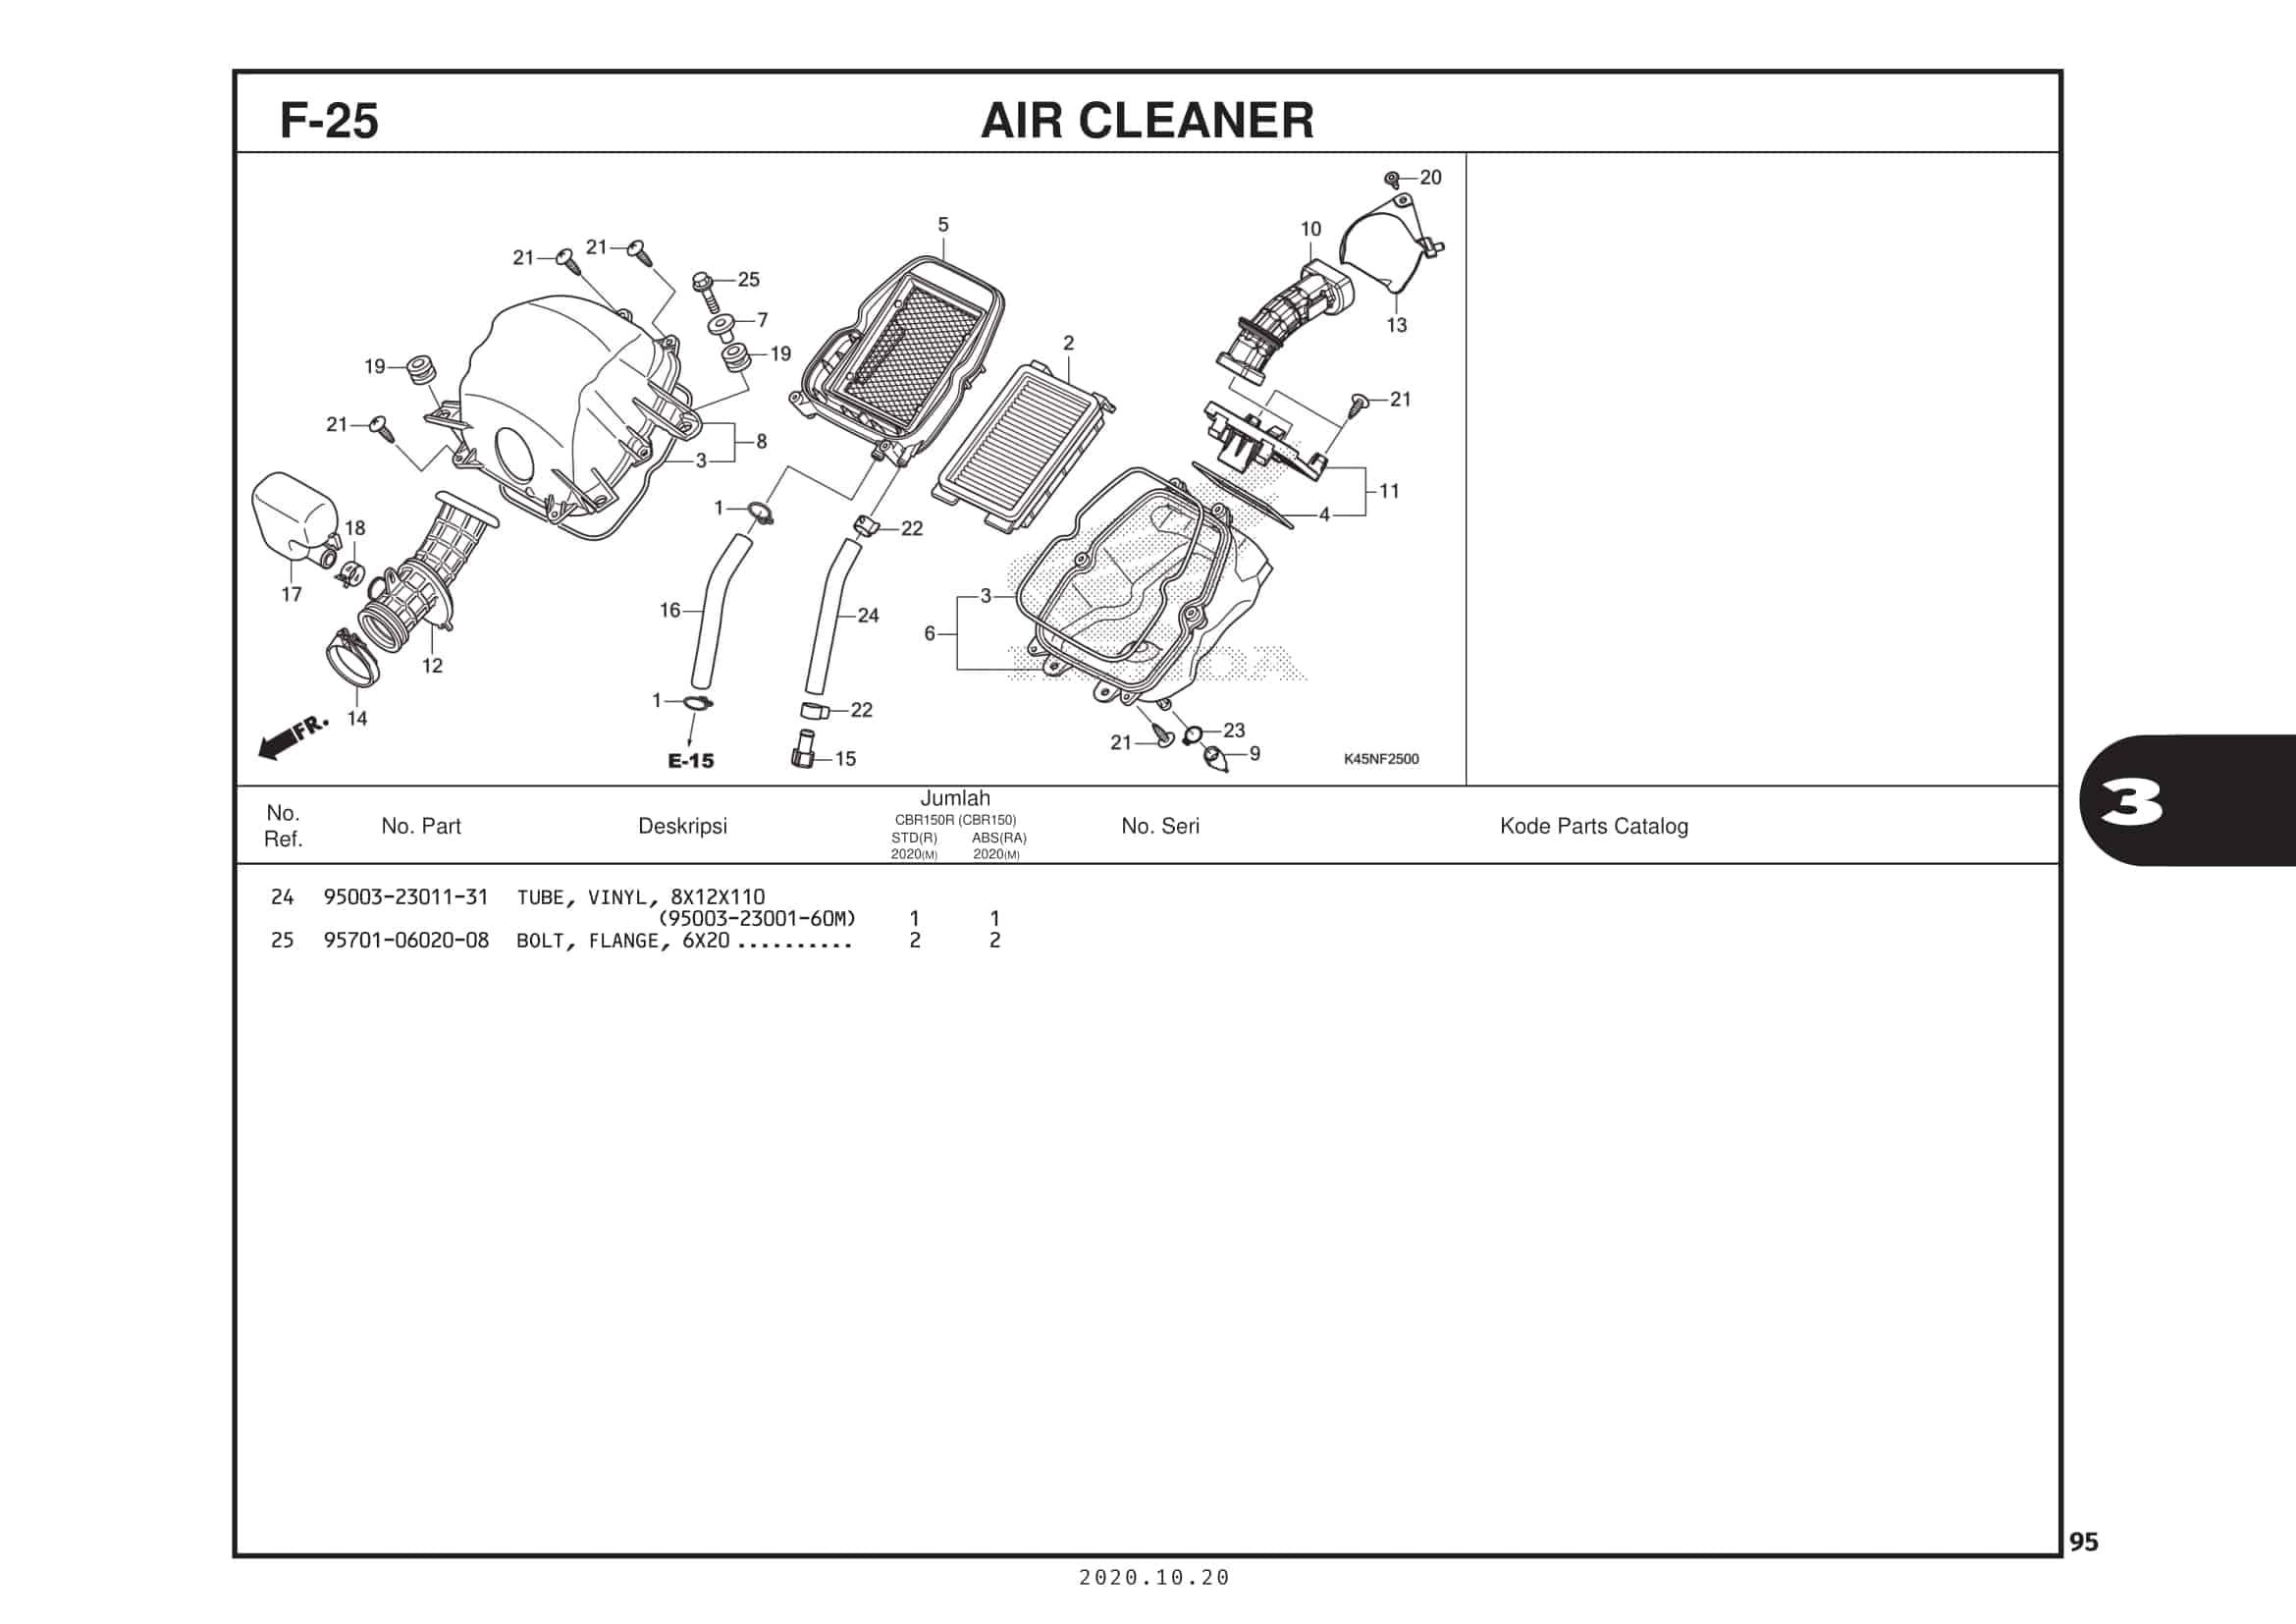 F-25 Air Cleaner